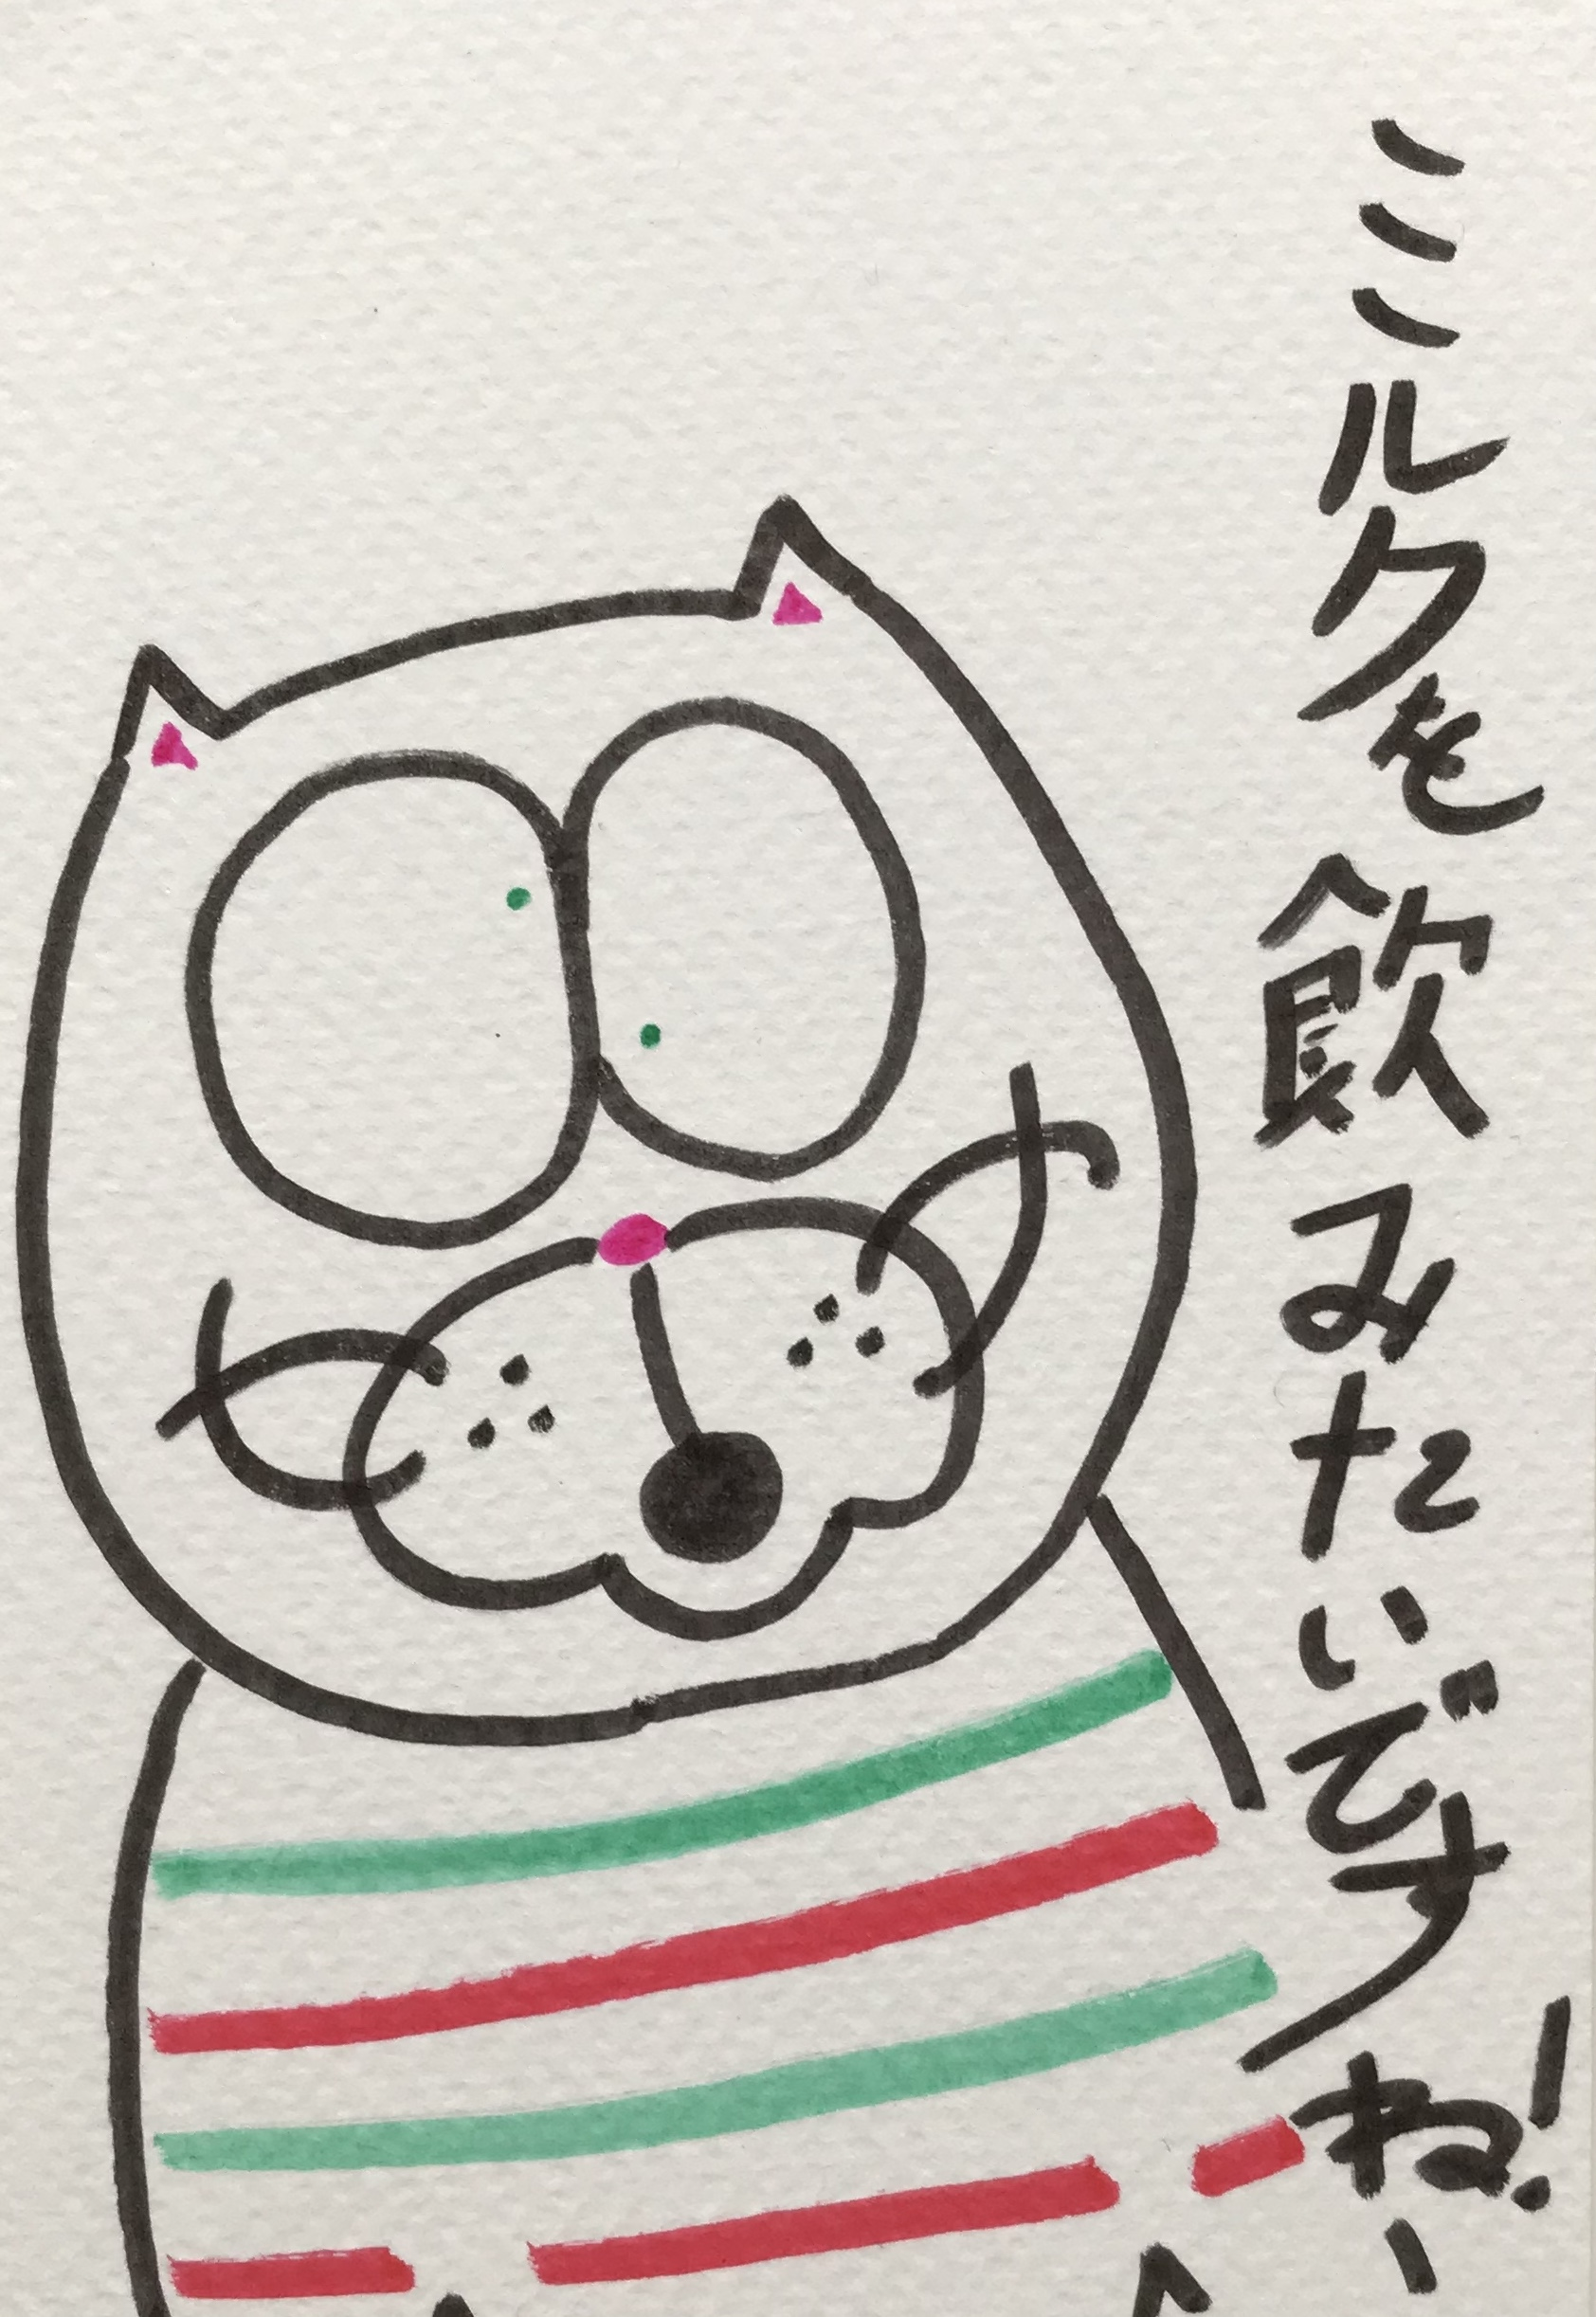 I want to drink miylk! striped Japanese